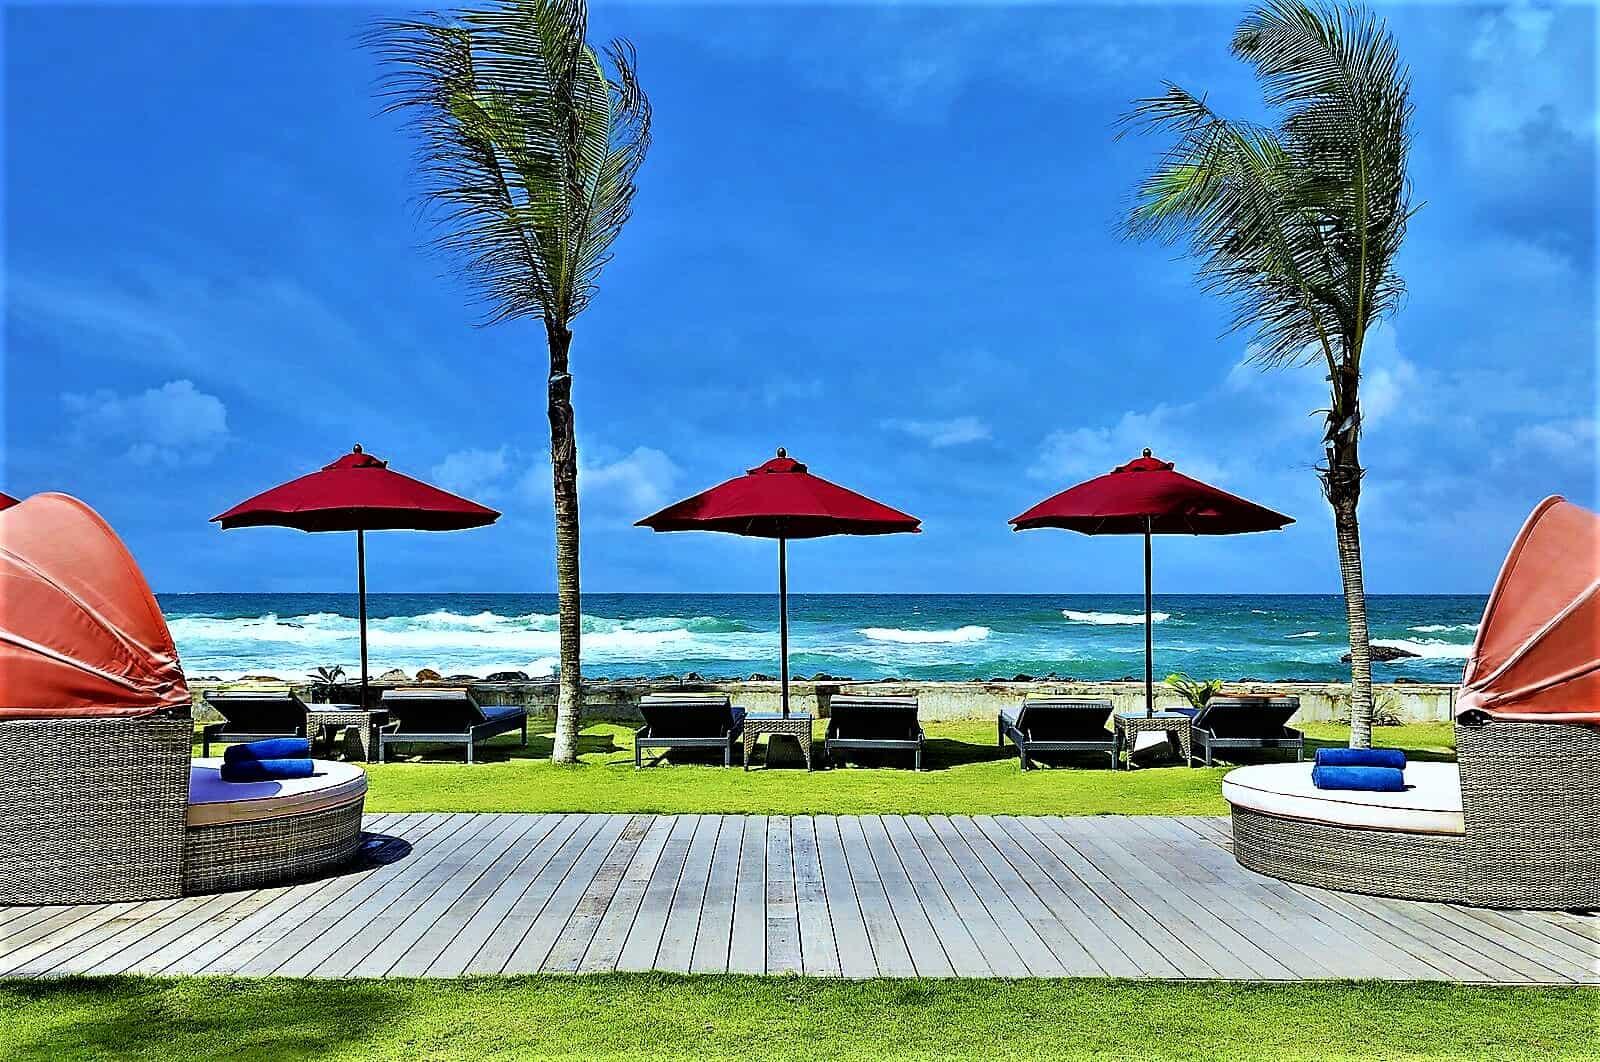 image-of-sri-lanka-amari-Galle-hotel-beach-front